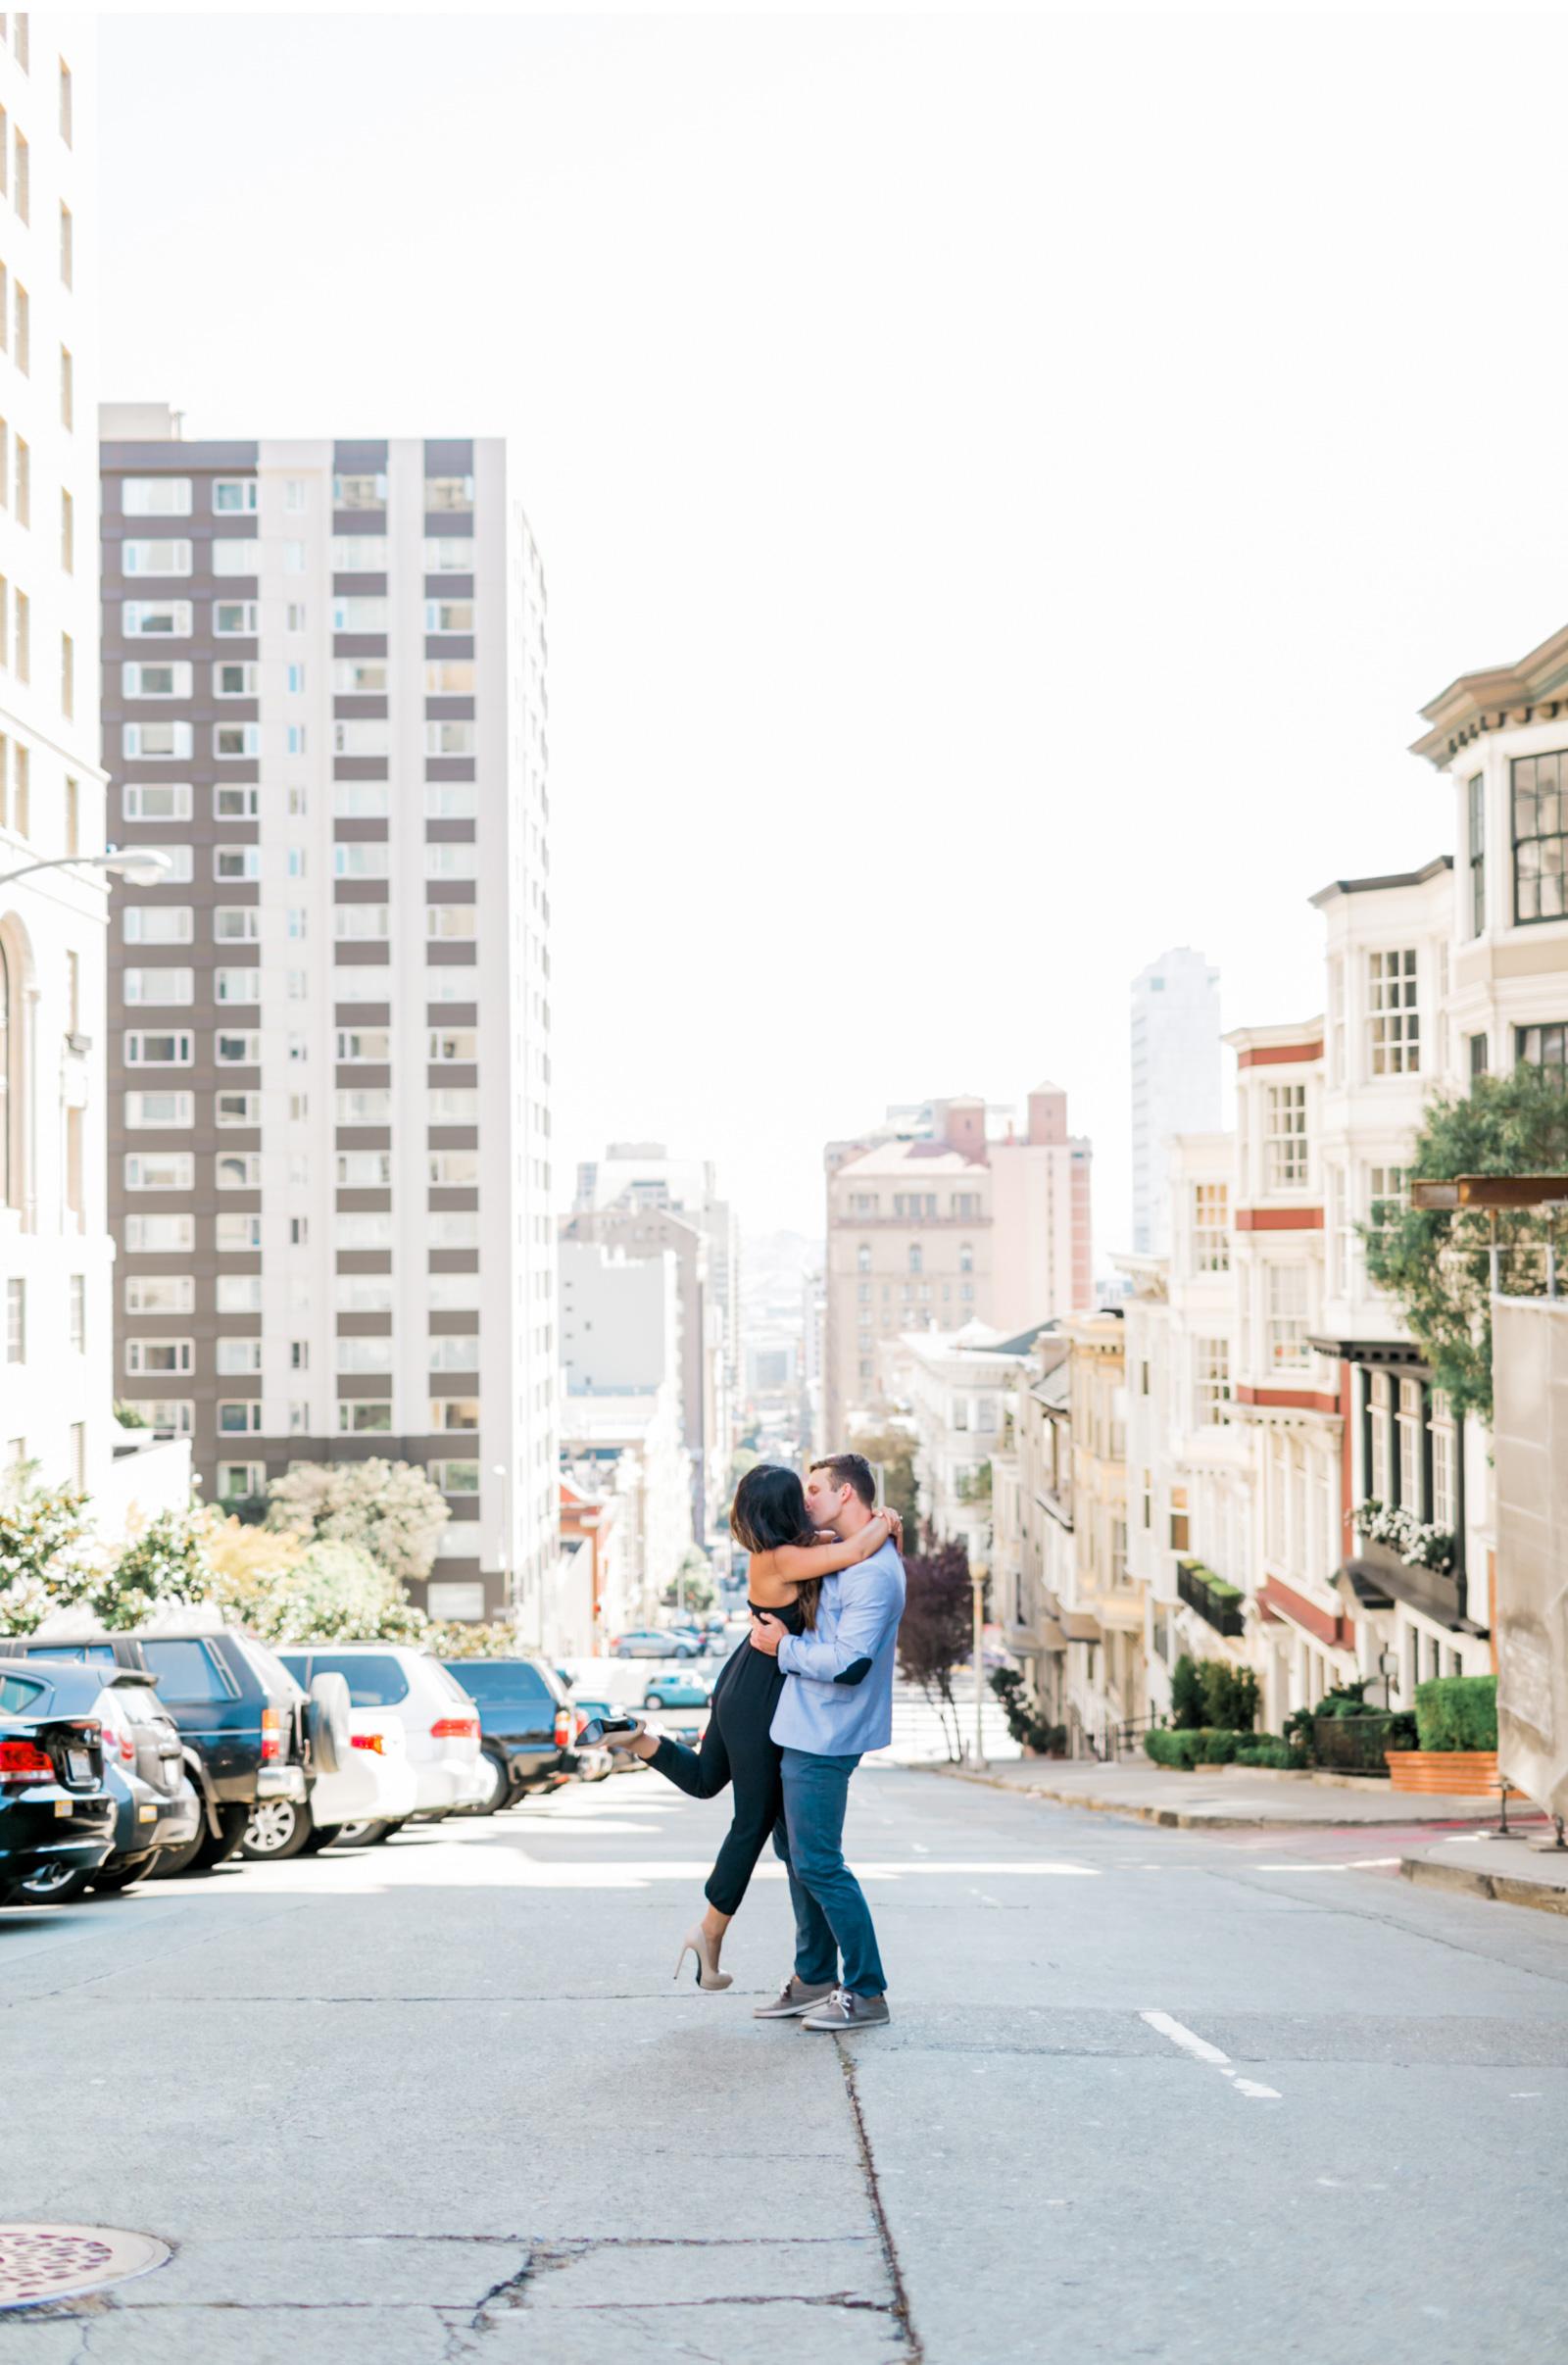 Malibu-Wedding-Photographer-Natalie-Schutt-Photography-Style-Me-Pretty_04.jpg